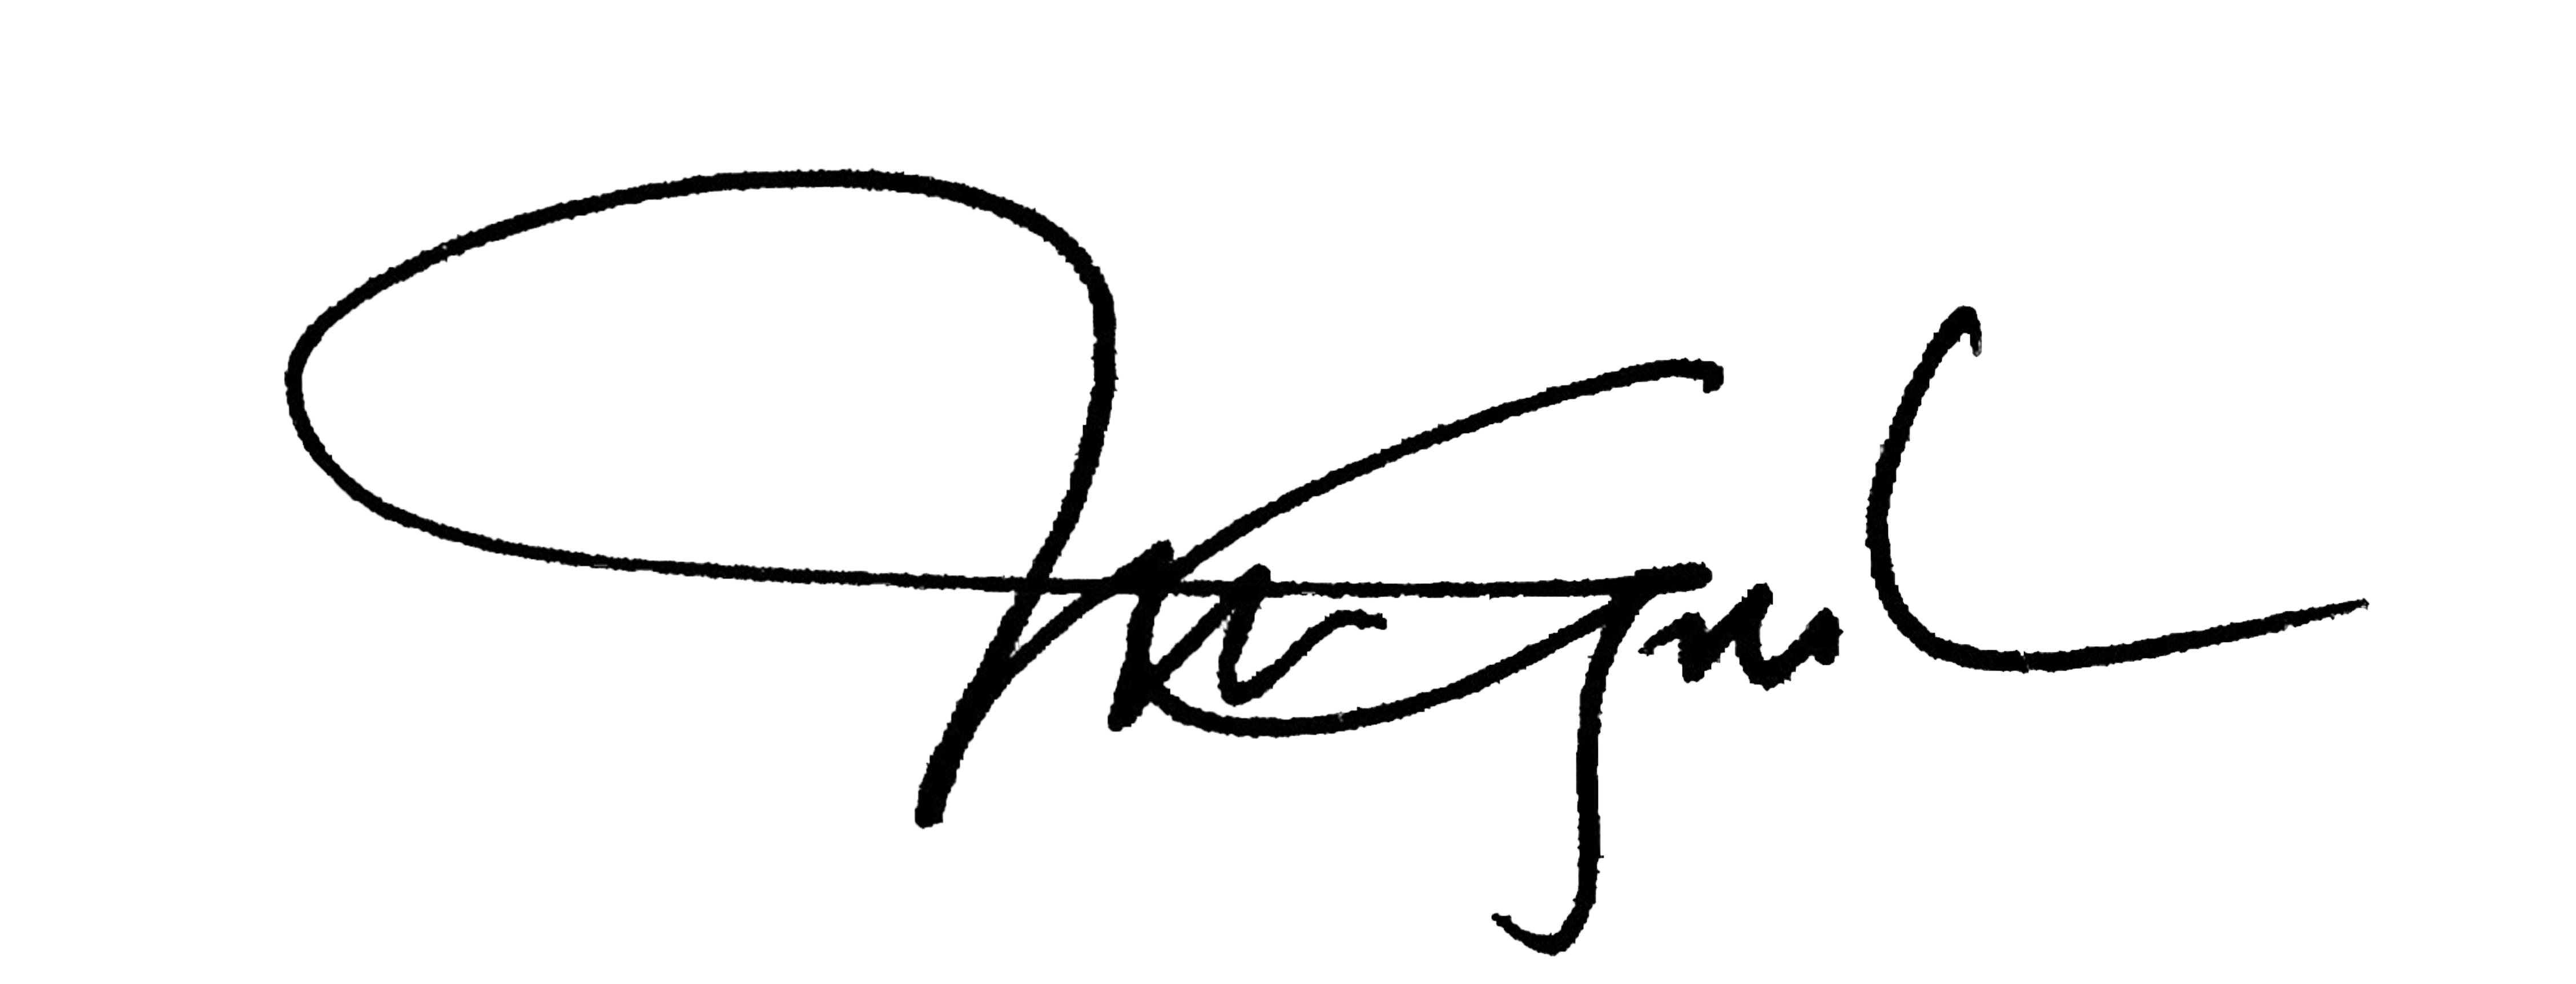 Angela Merici Gabriel Signature